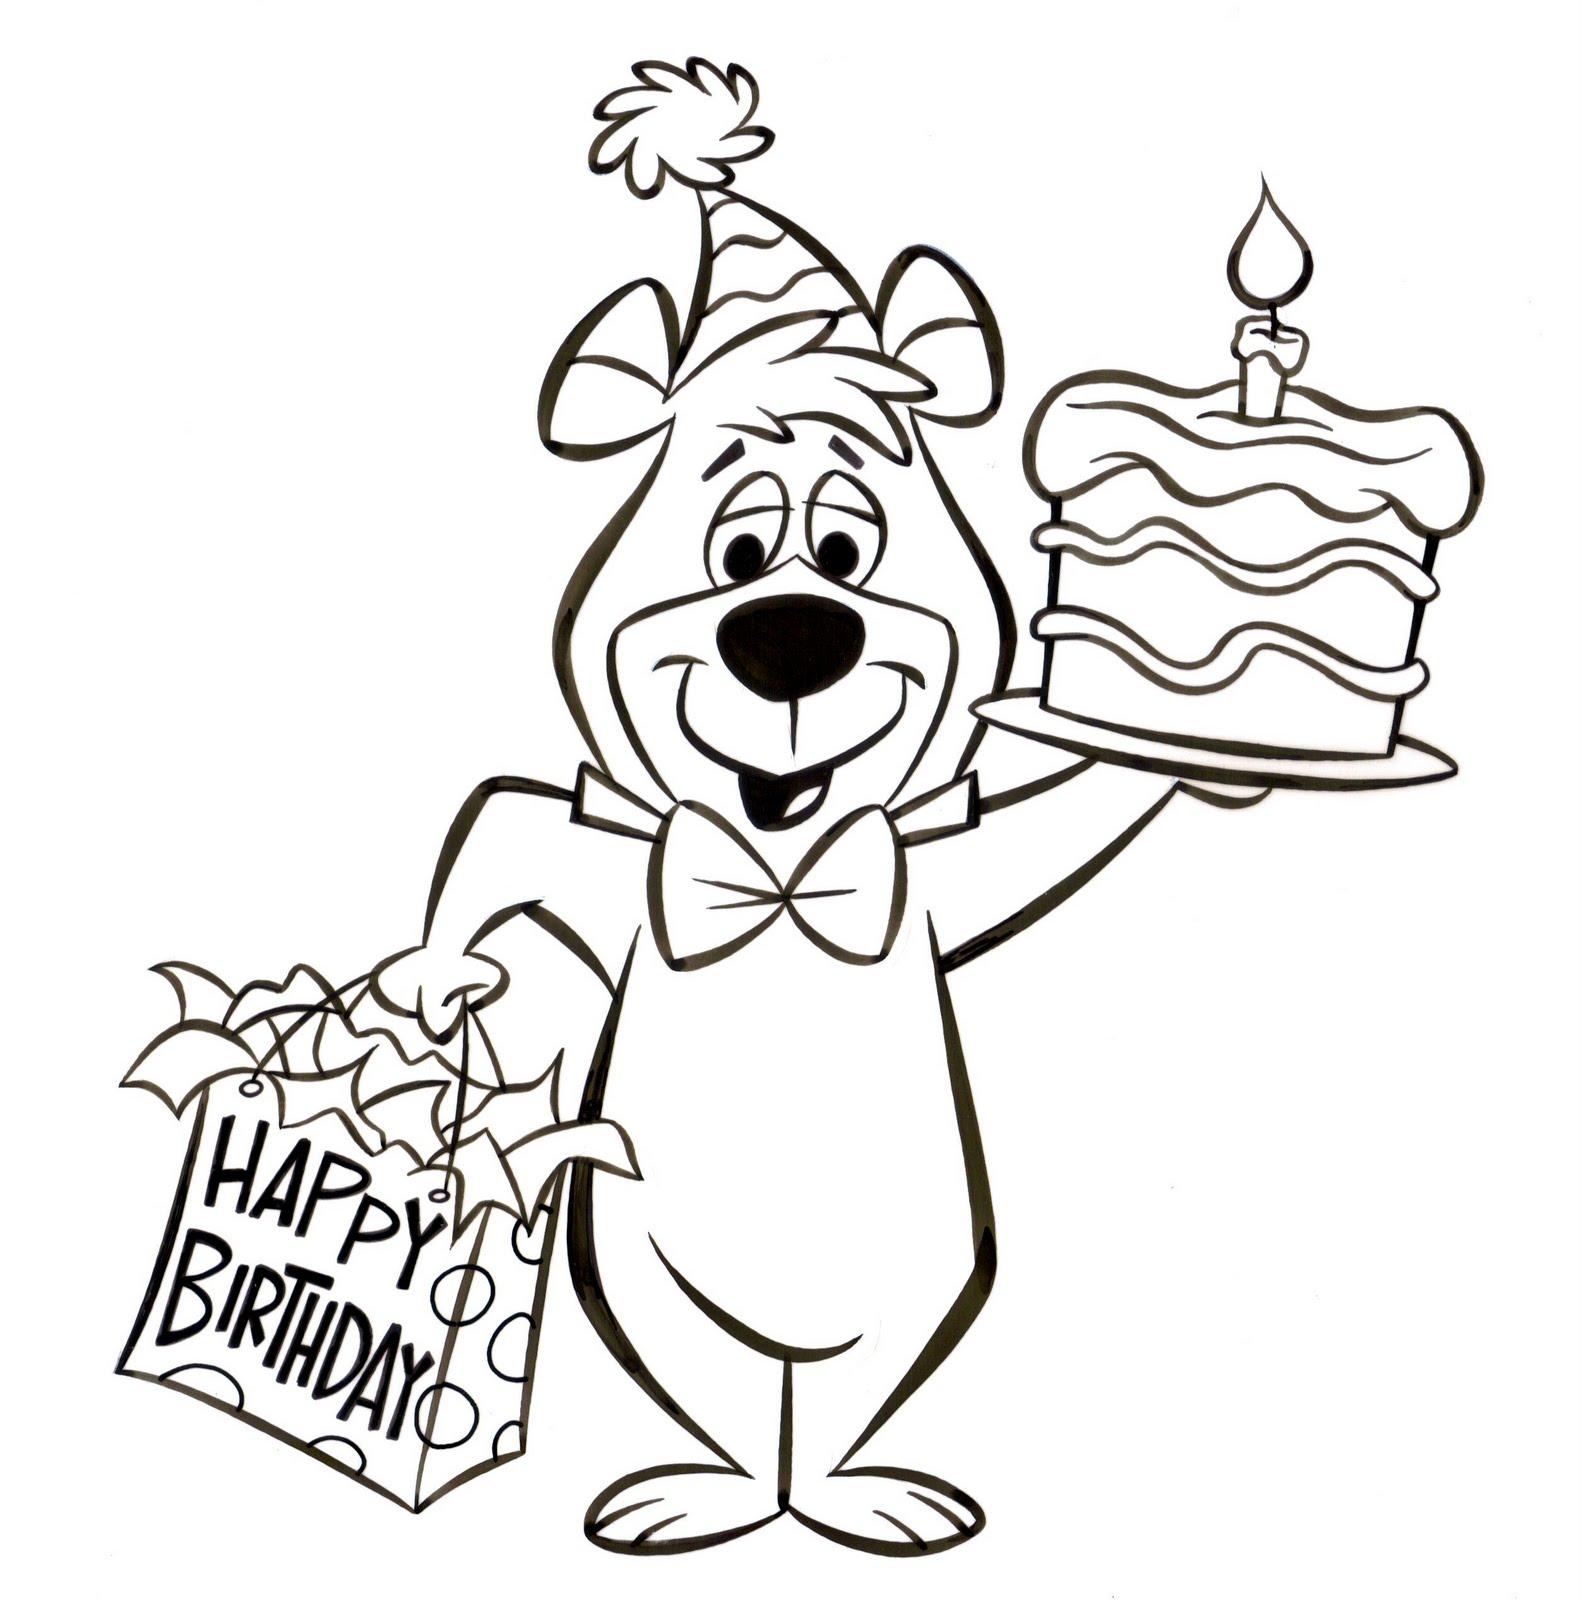 patrick owsley cartoon art and more! yogi bear birthday art!